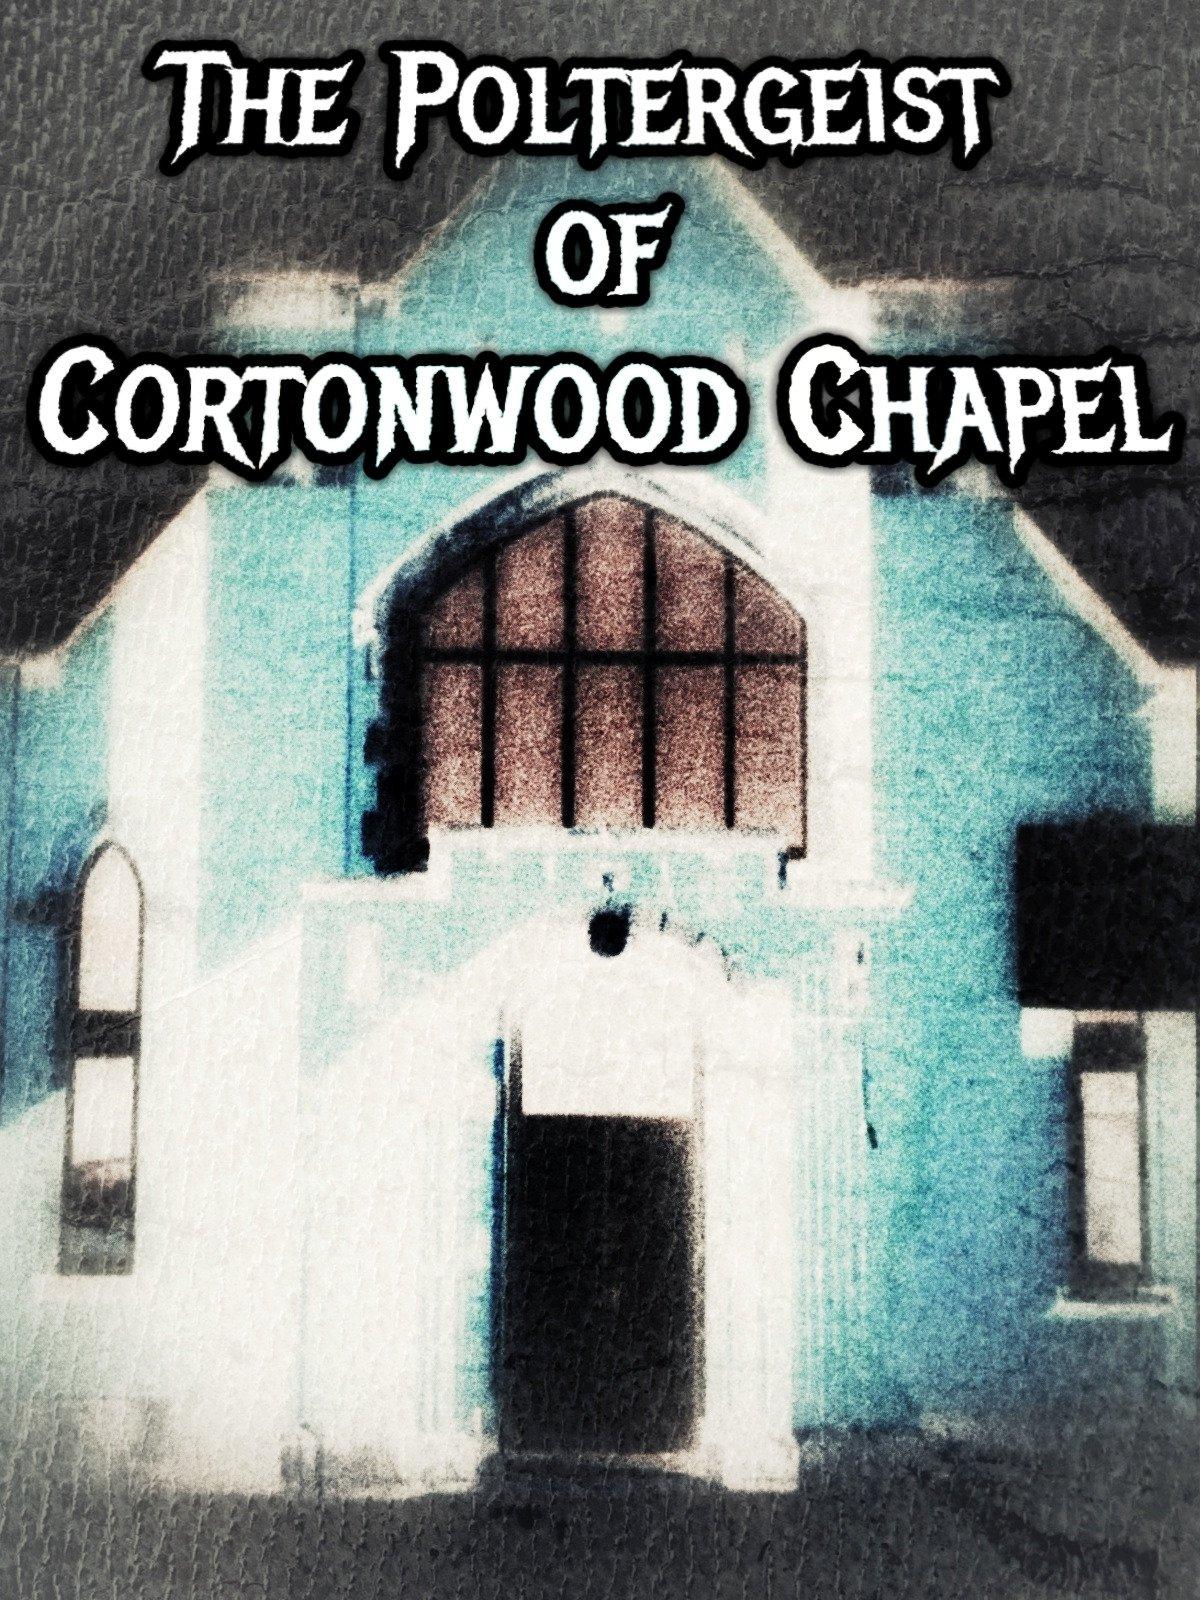 The Poltergeist of Cortonwood Chapel